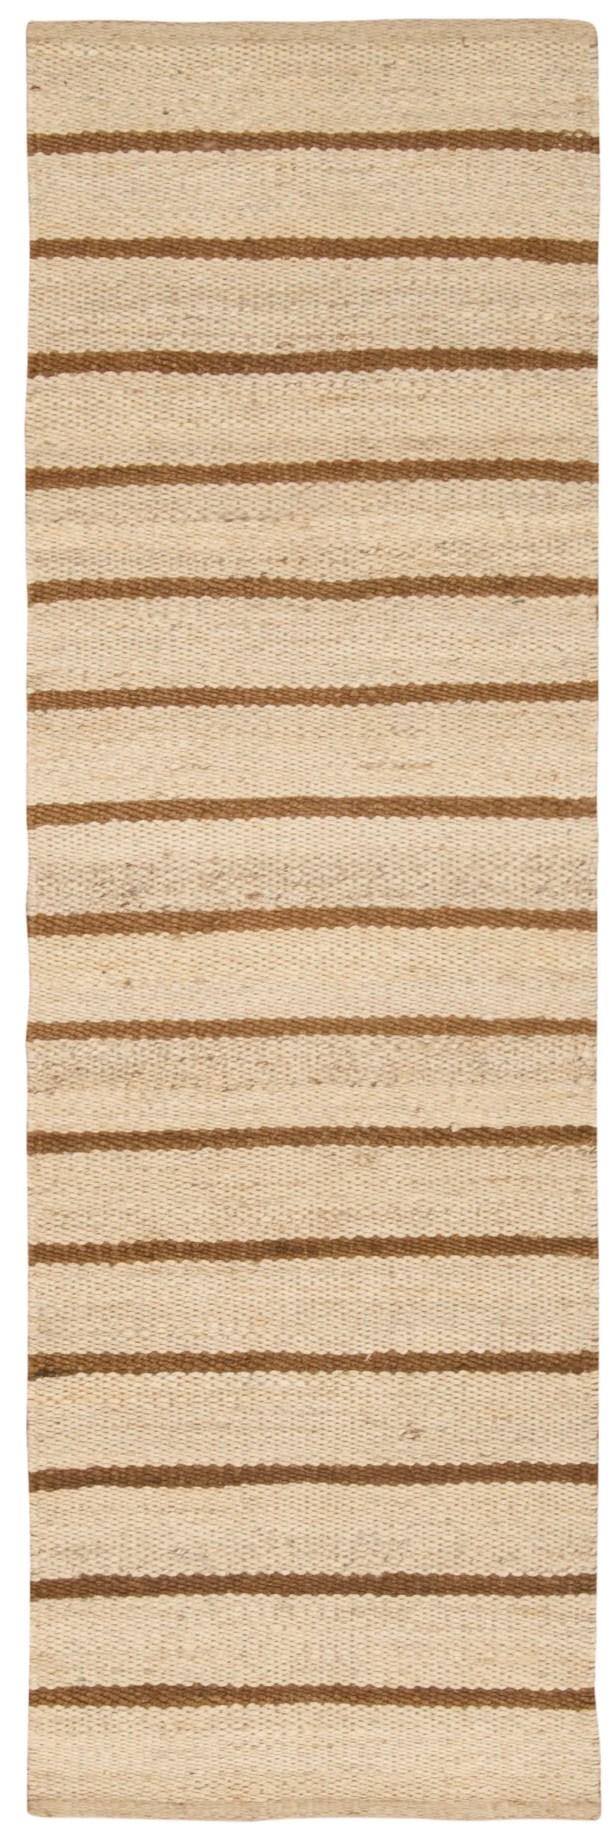 Laflin Hand-Woven Brown/Wheat Area Rug Rug Size: Rectangle 5' x 7'6